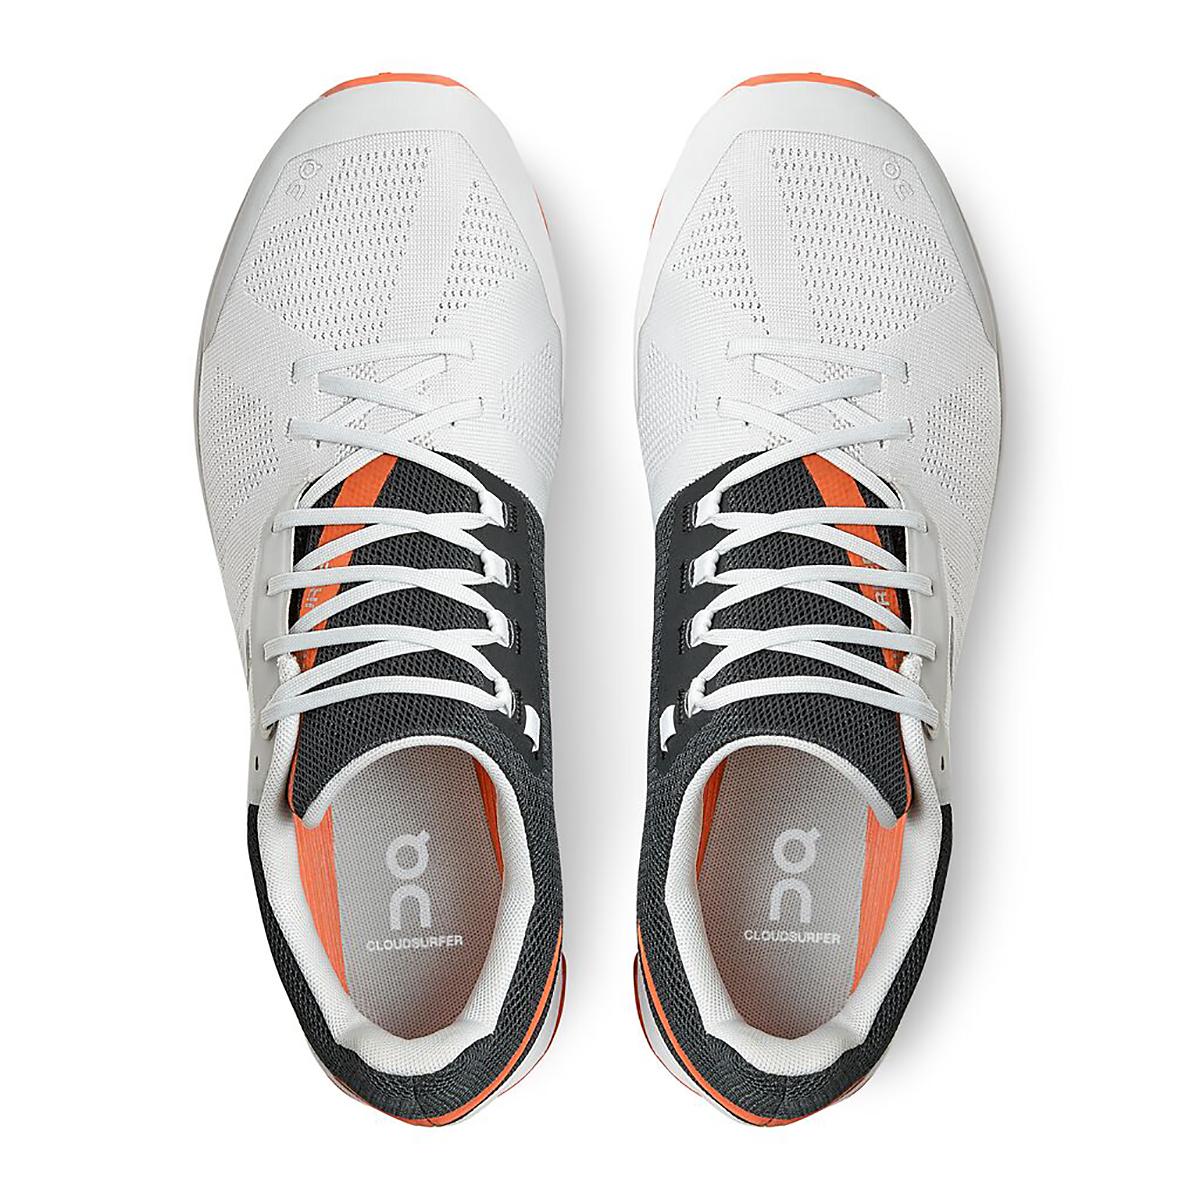 Men's On Cloudsurfer Running Shoe - Color: Frost/Flame - Size: 7 - Width: Regular, Frost/Flame, large, image 3